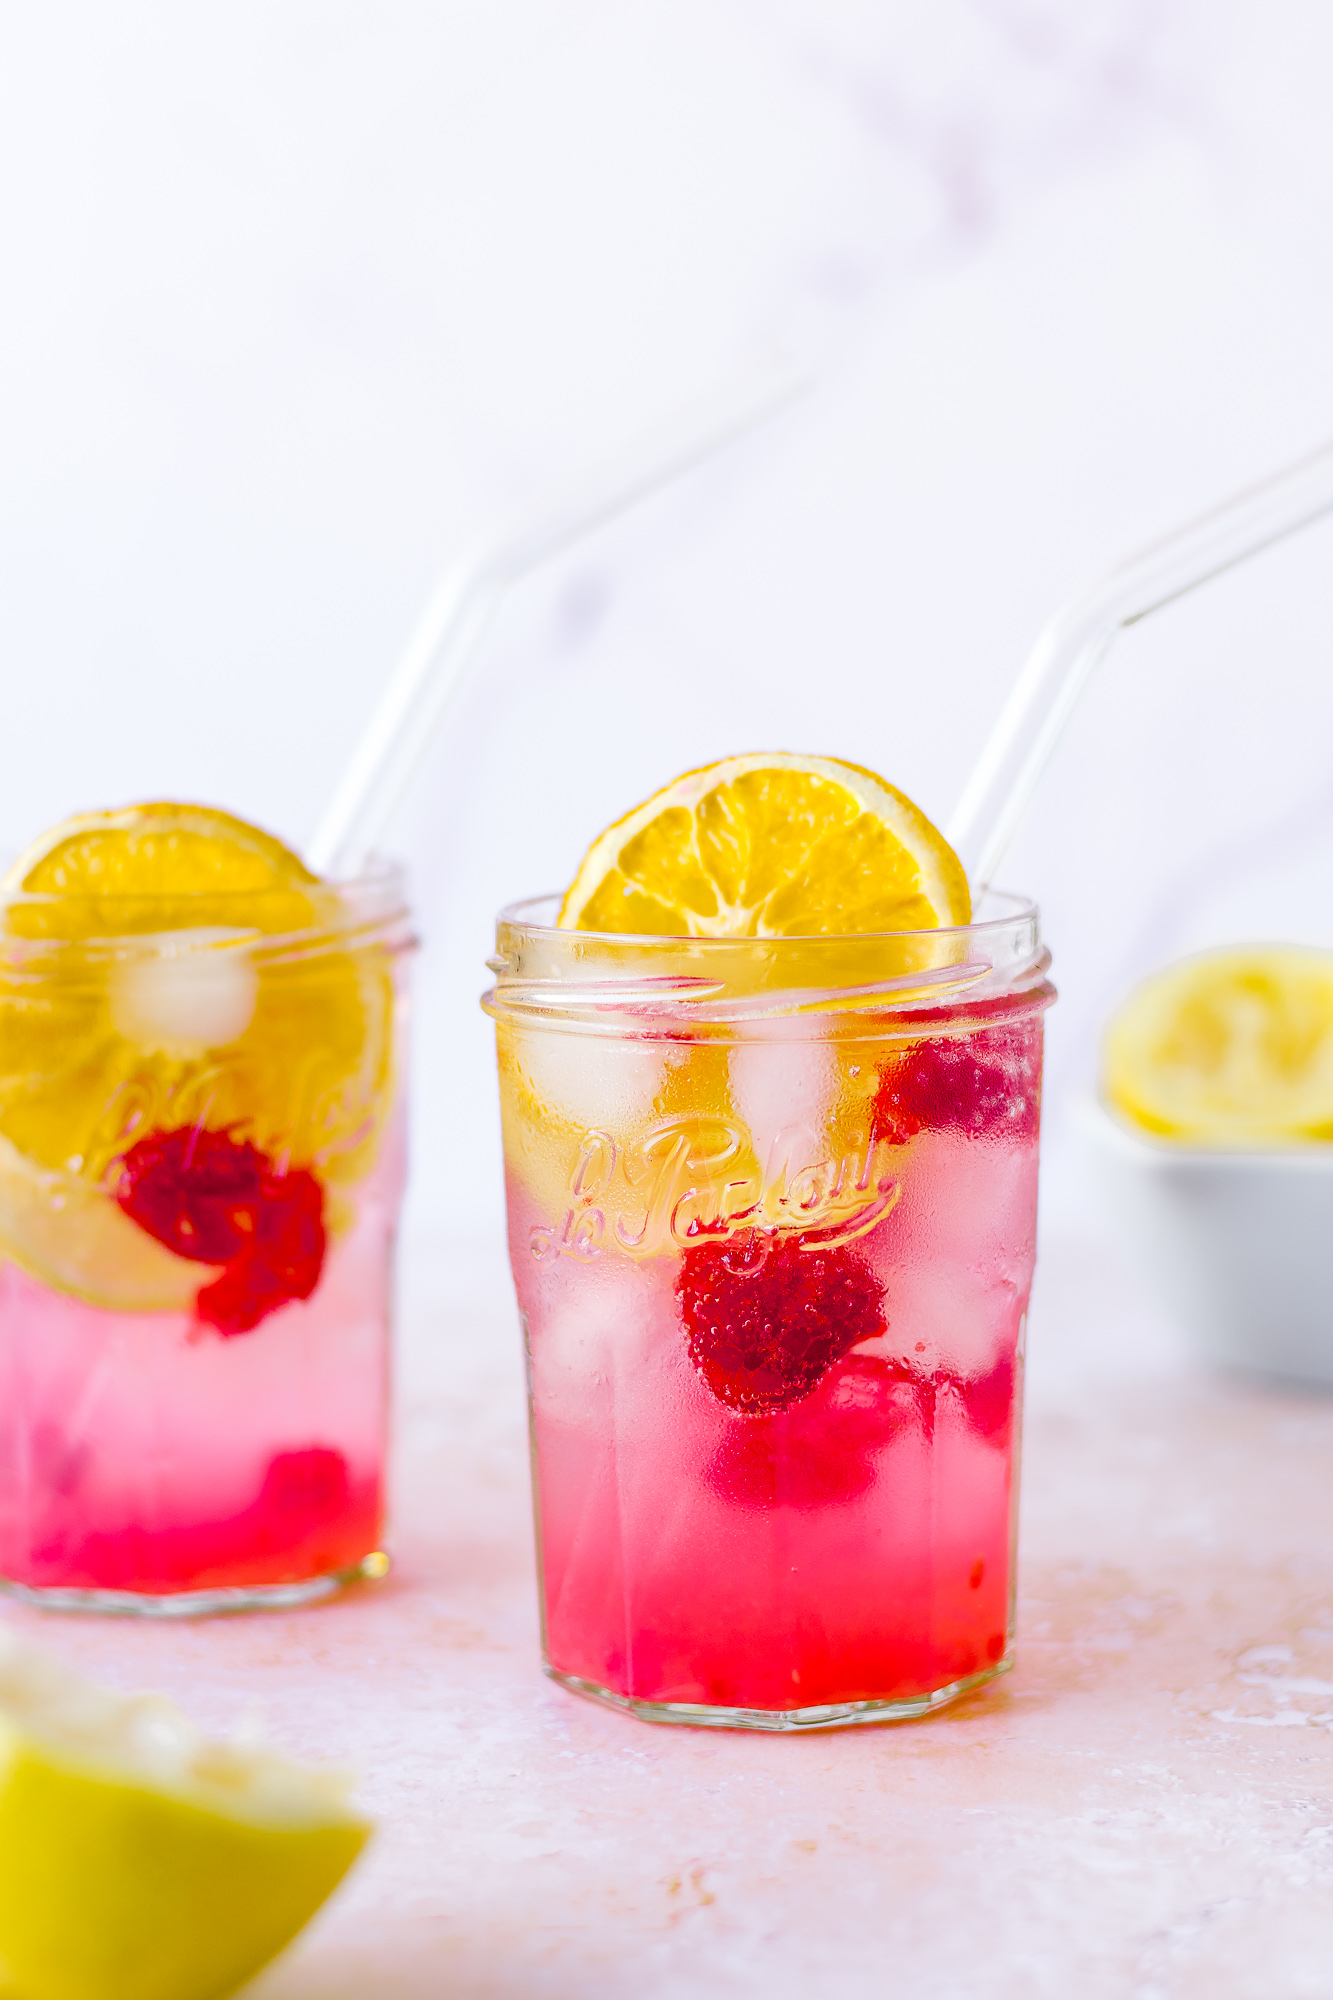 Healthier Lemon and Raspberry Lemonade